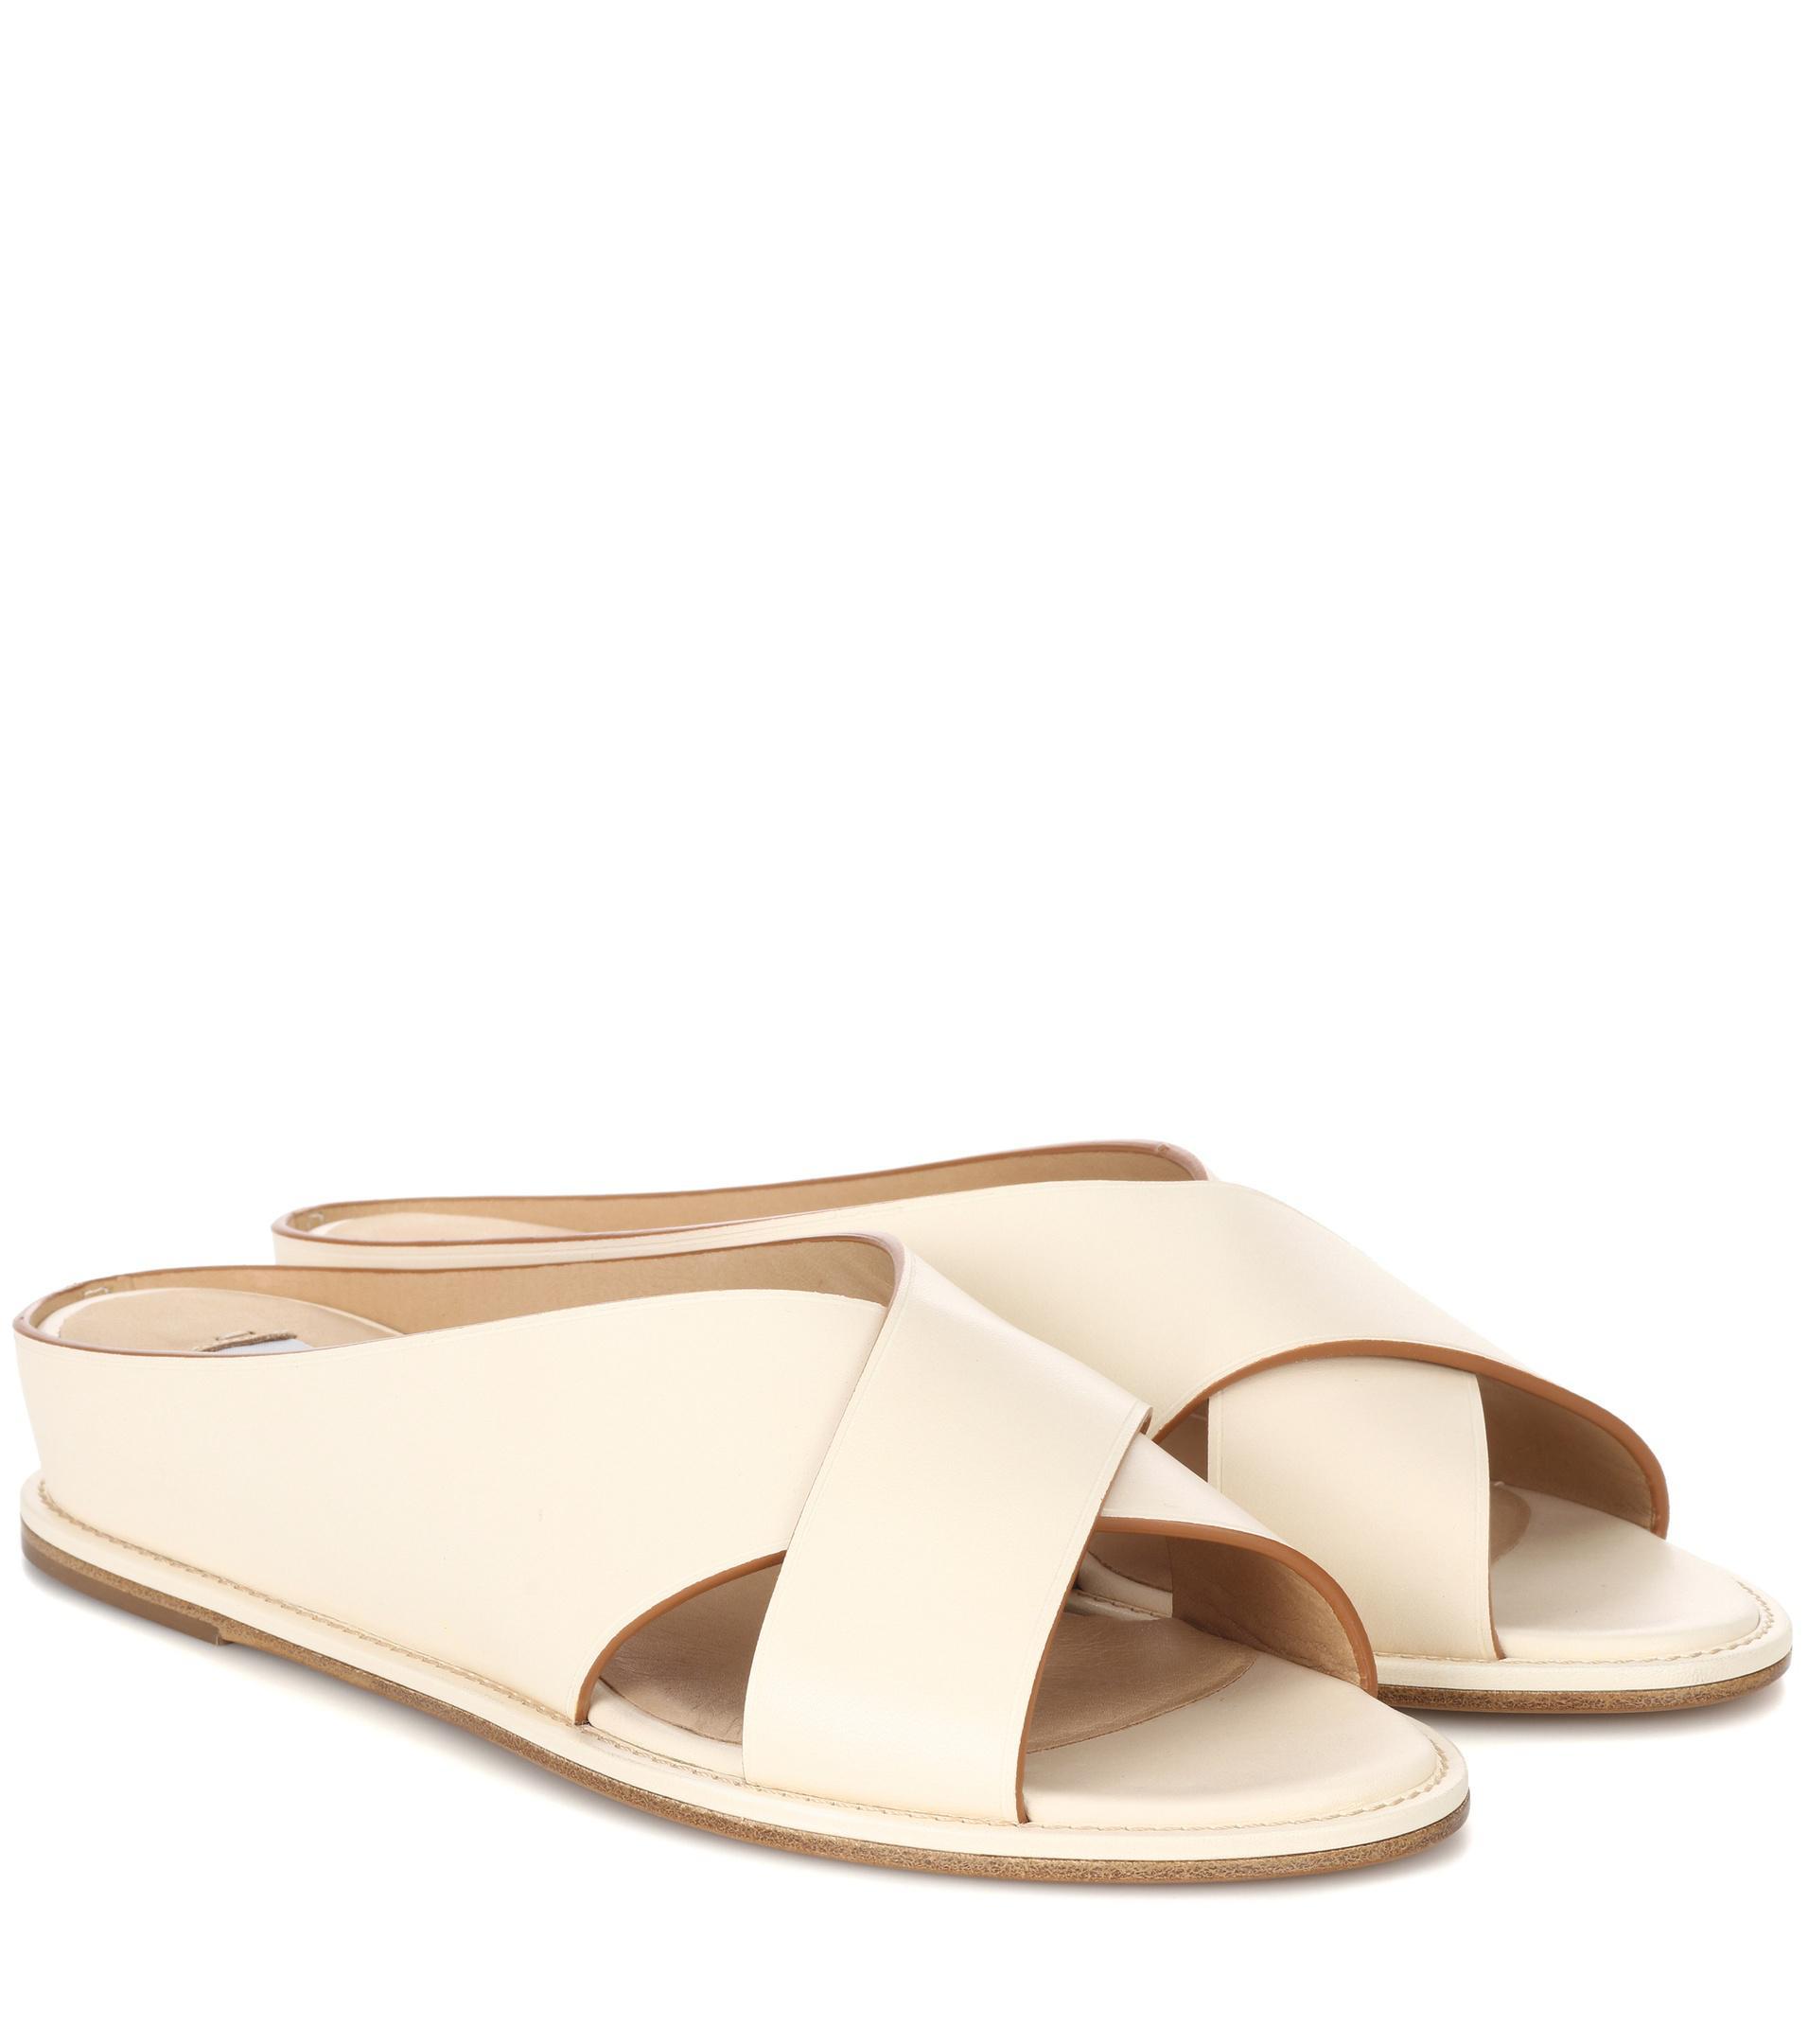 Ellington leather sandals Gabriela Hearst tSYcK95Z